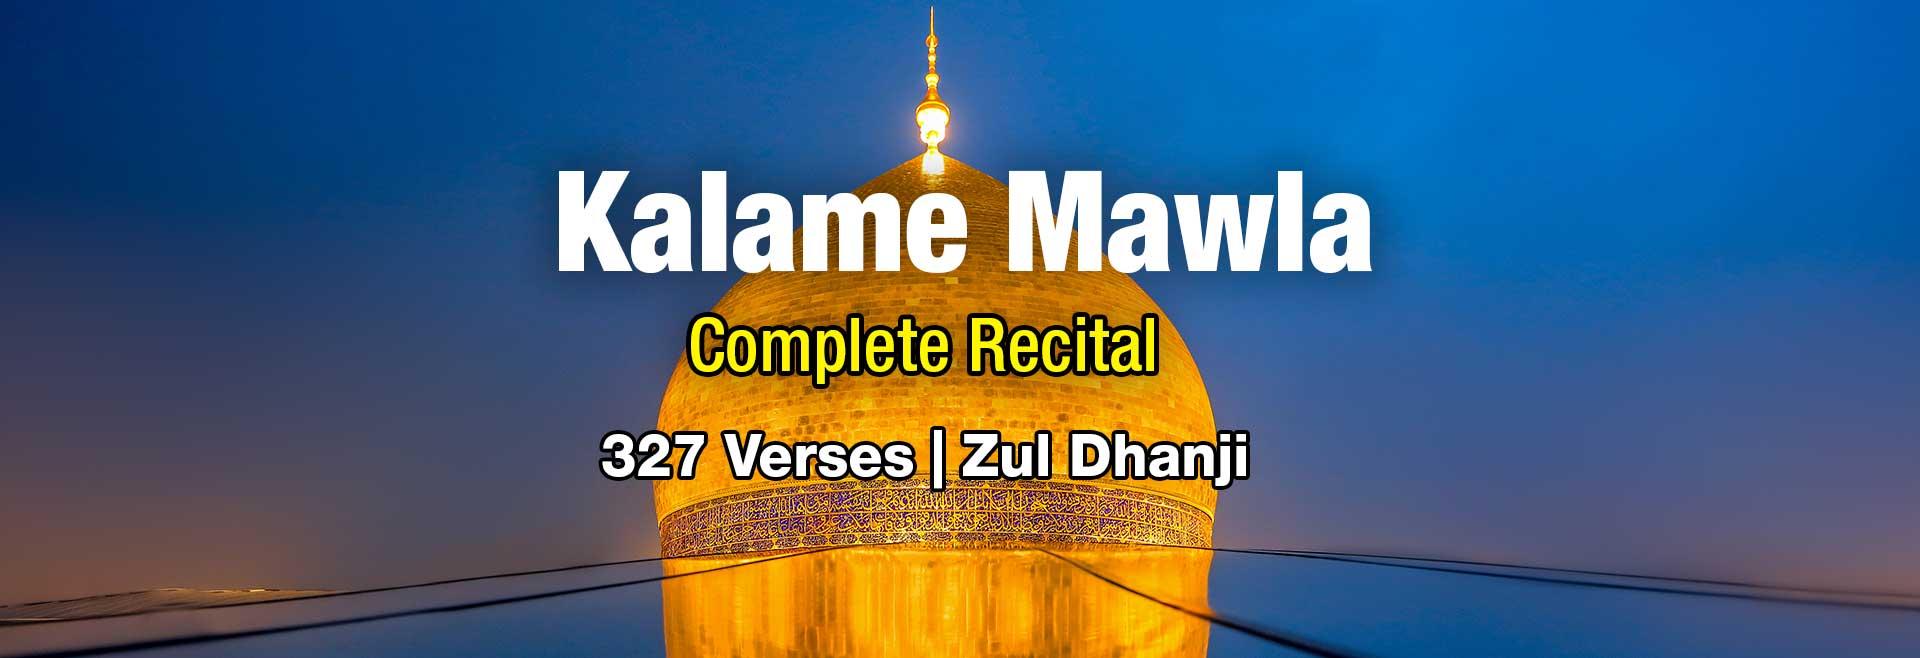 Kalame Mawla - Complete Recital